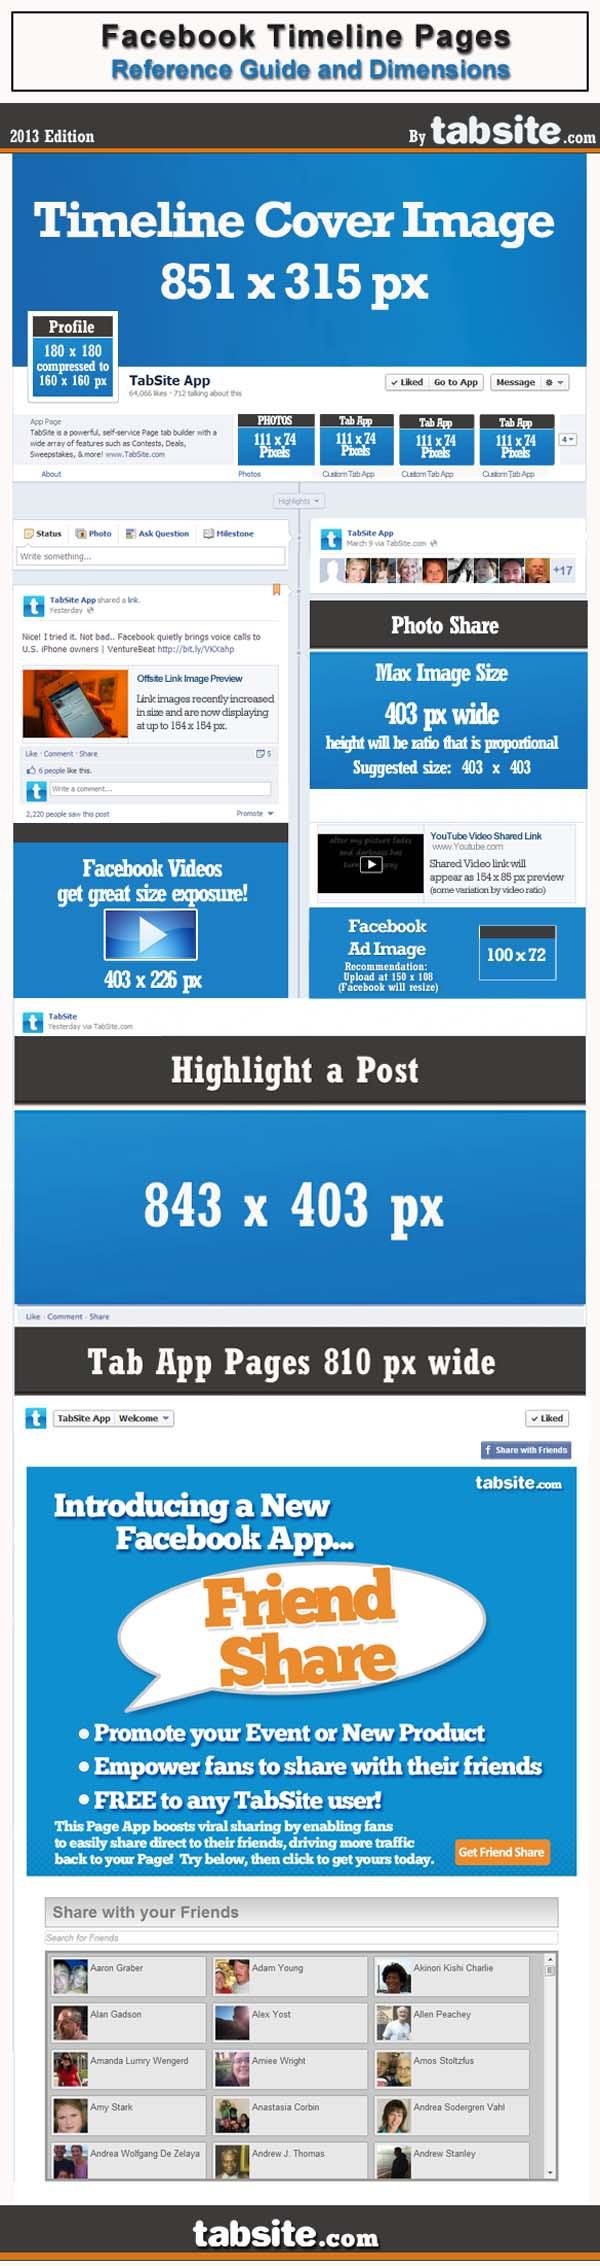 Facebook Timeline එක ලස්සනට තියාගන්නේ කොහමද? – Infographic